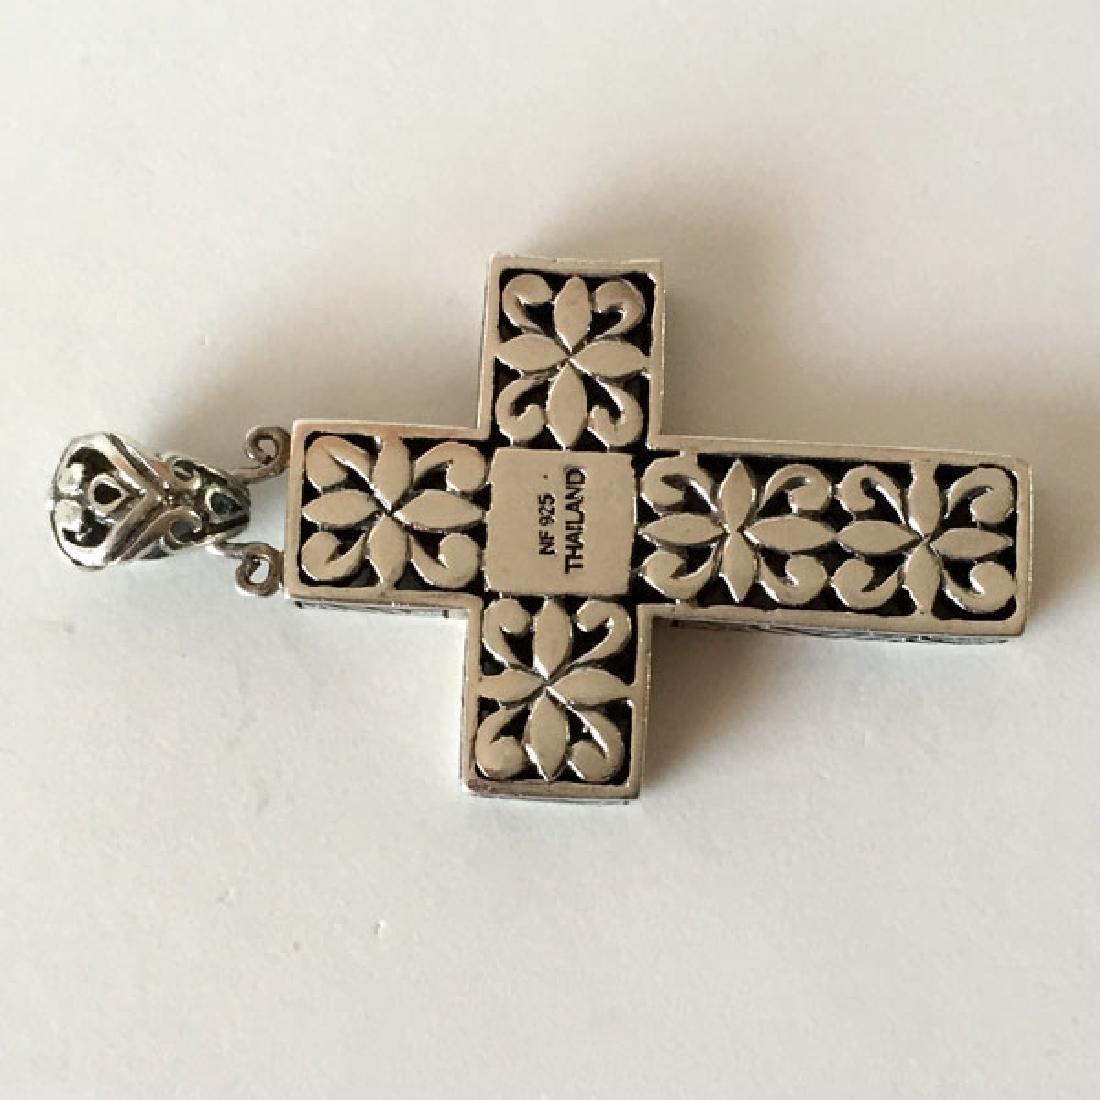 Sterling silver antique finish cross shape pendant - 3